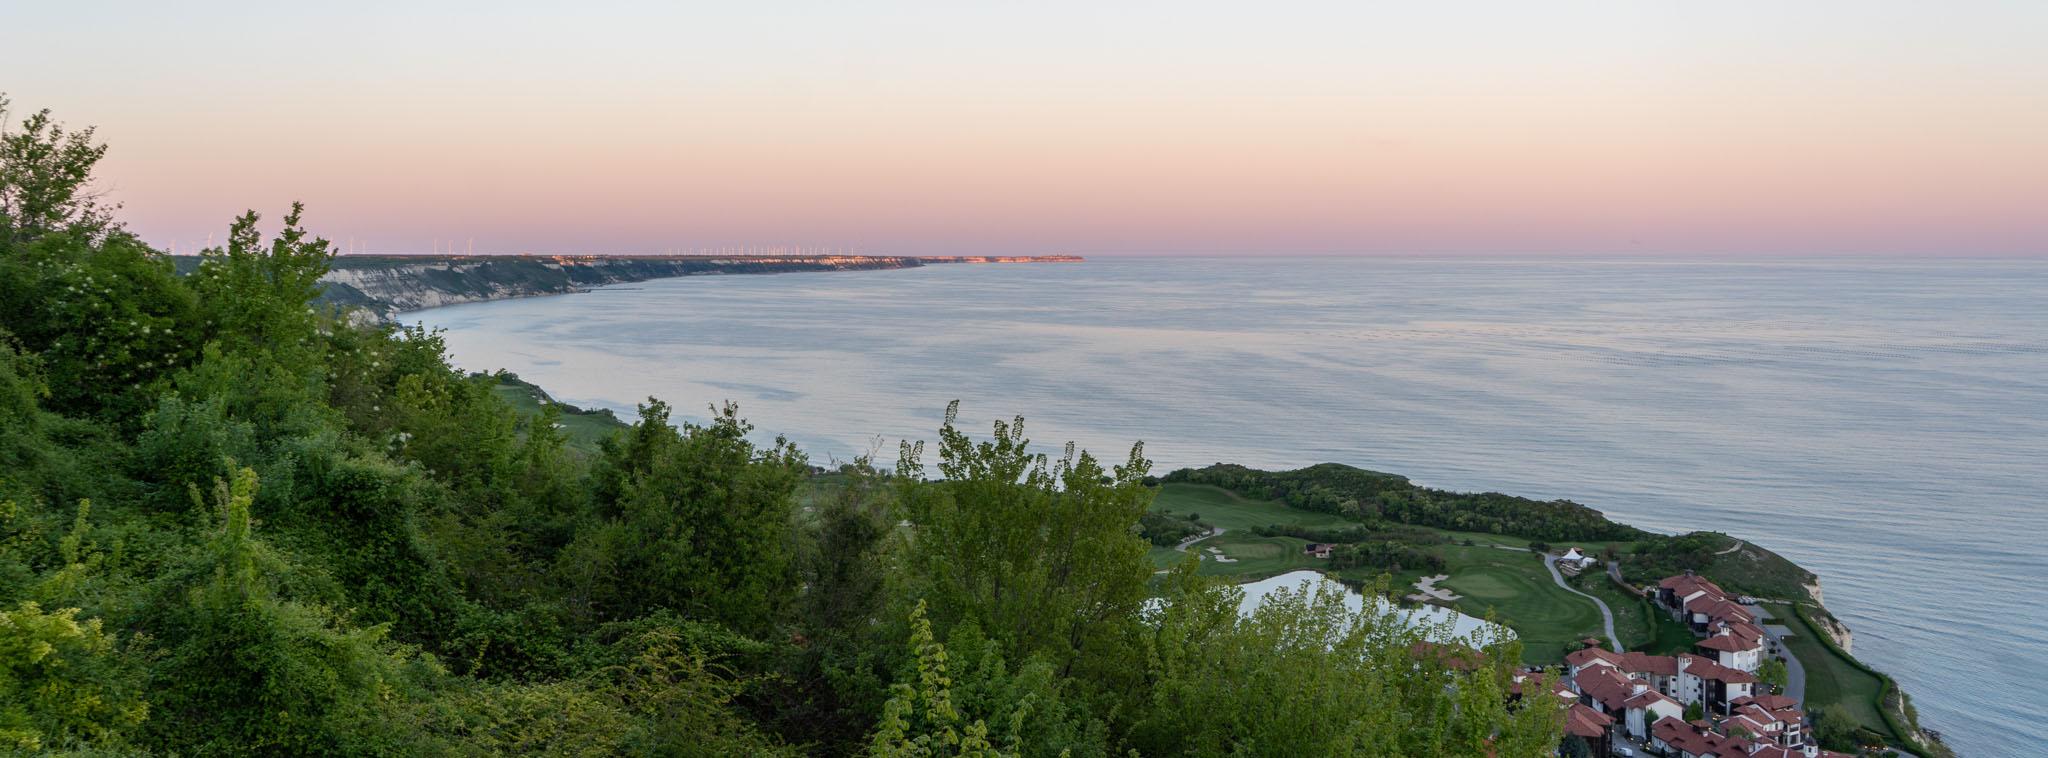 Goldstrand fkk strand bulgarien Haus kaufen